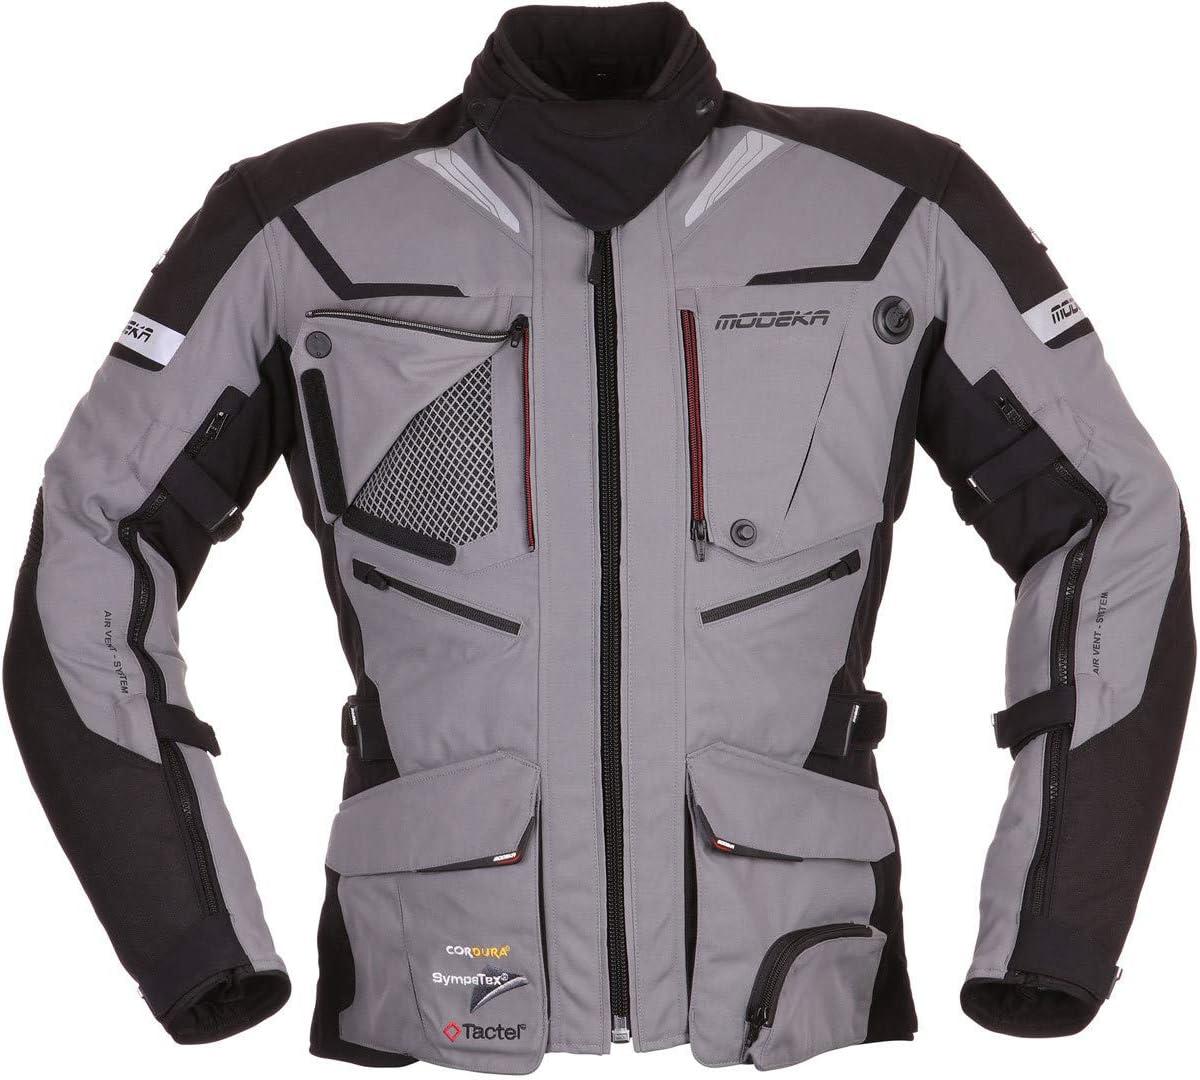 Modeka Panamericana Motorrad Textiljacke Grau Schwarz M Auto